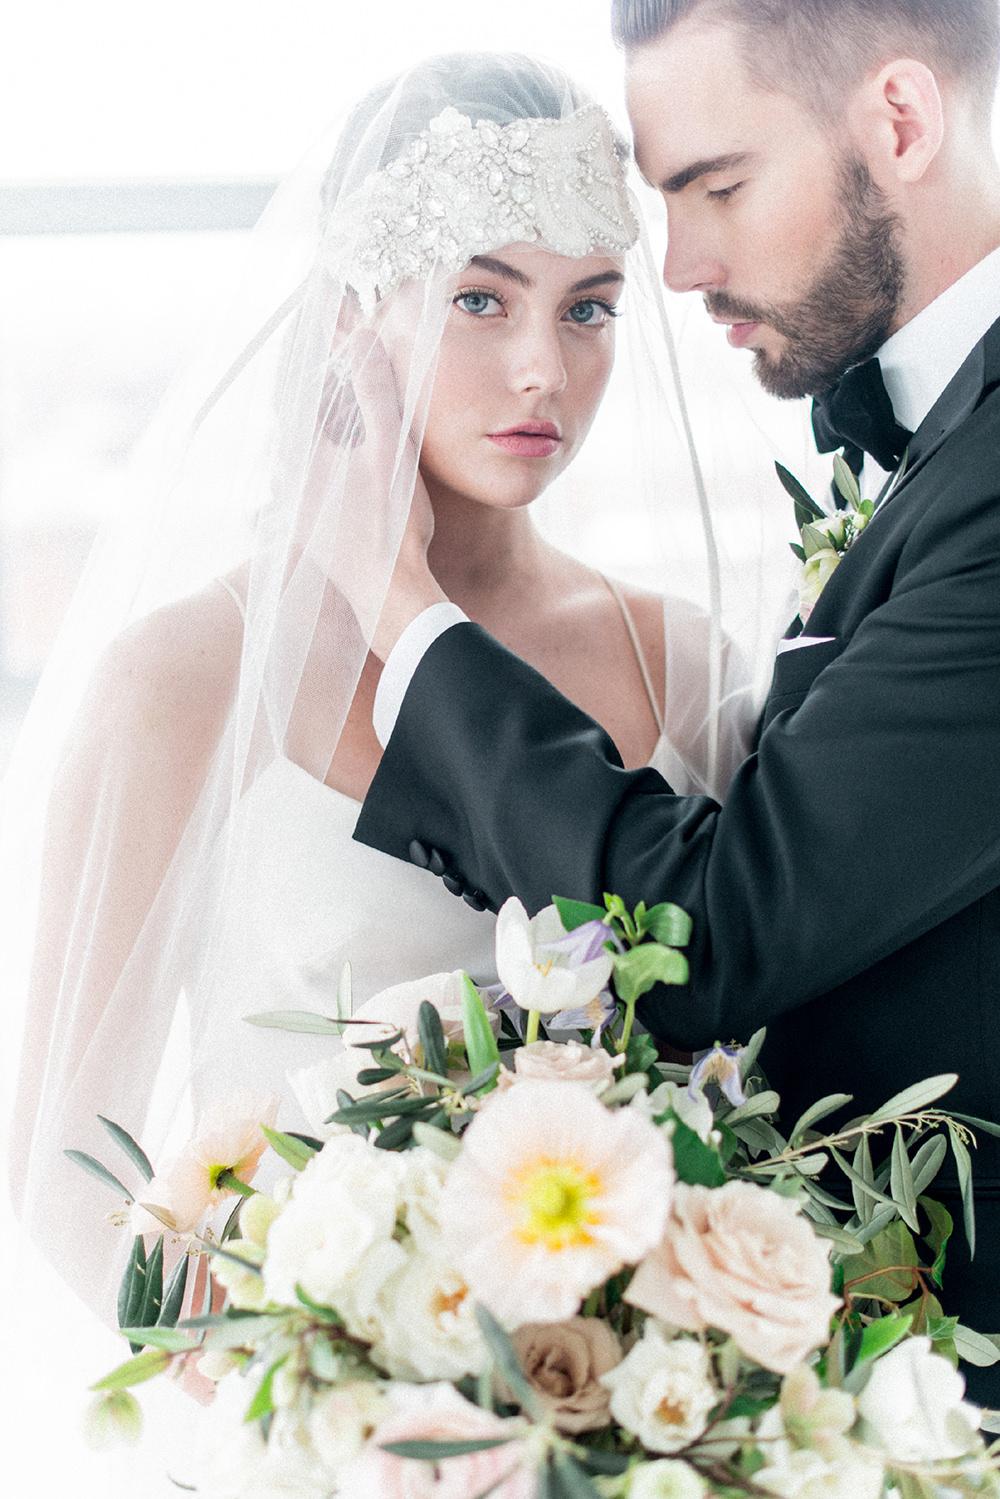 wedding ceremonies - photo by Laura Kelly Photography https://ruffledblog.com/minimalist-monochrome-european-wedding-inspiration